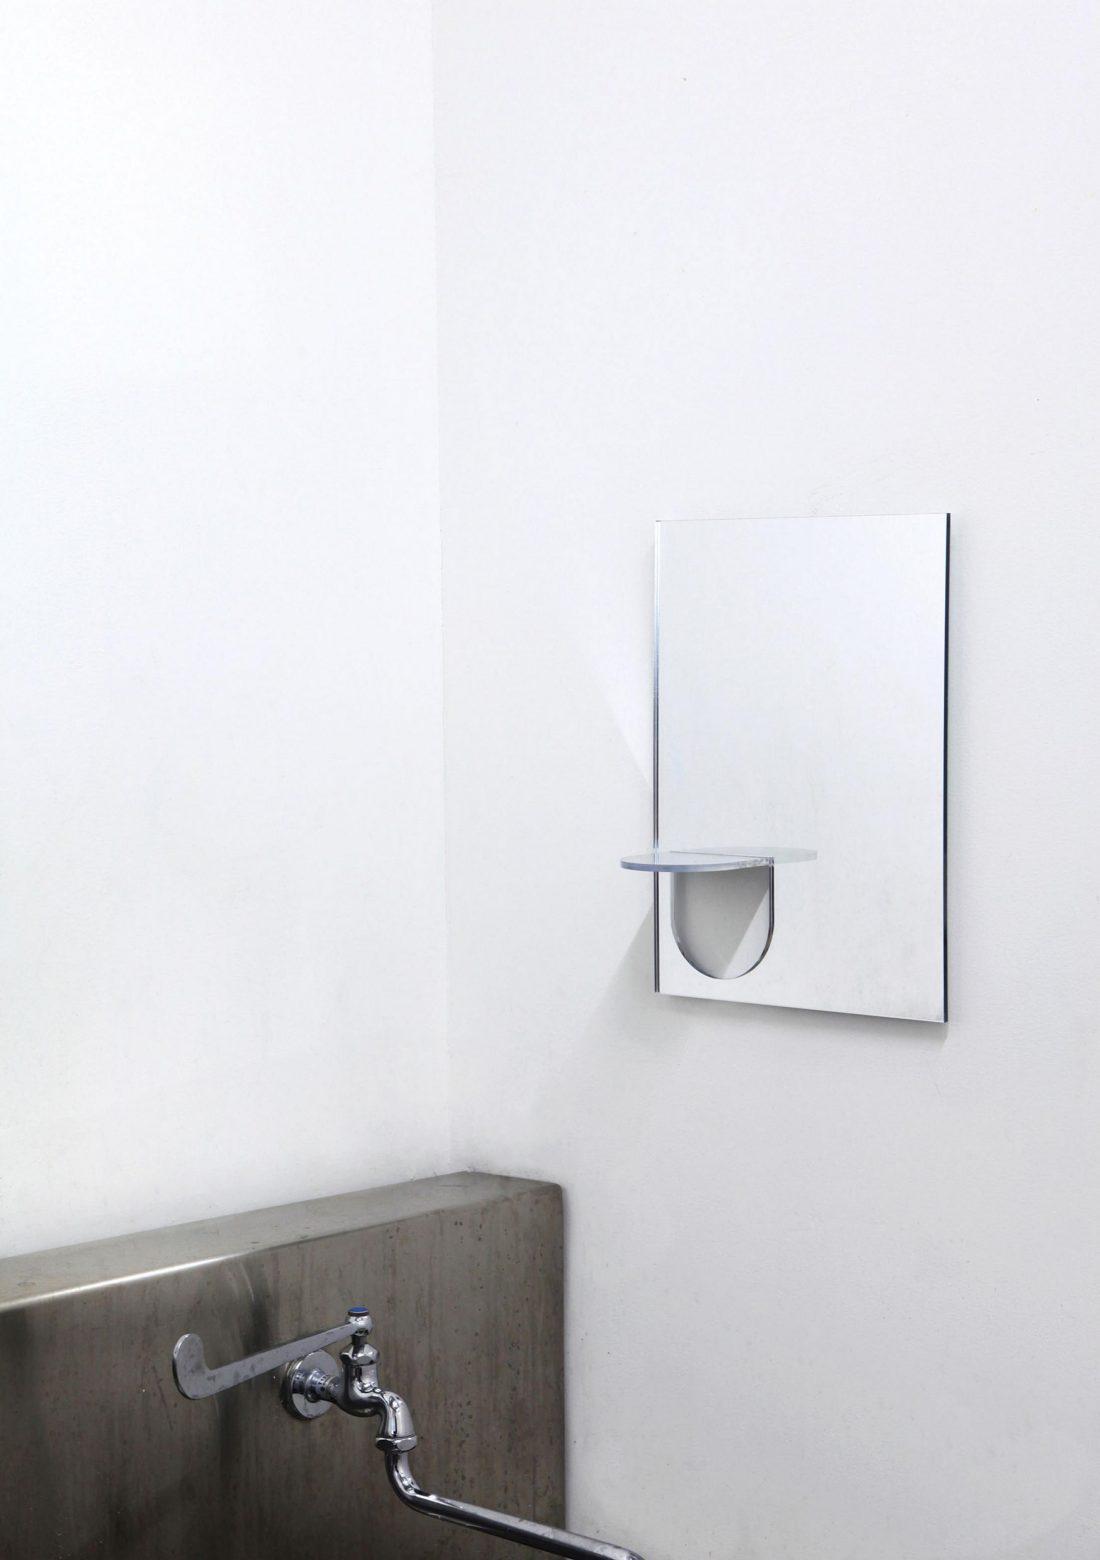 Lustro the U mirror, prod. studio yumakano